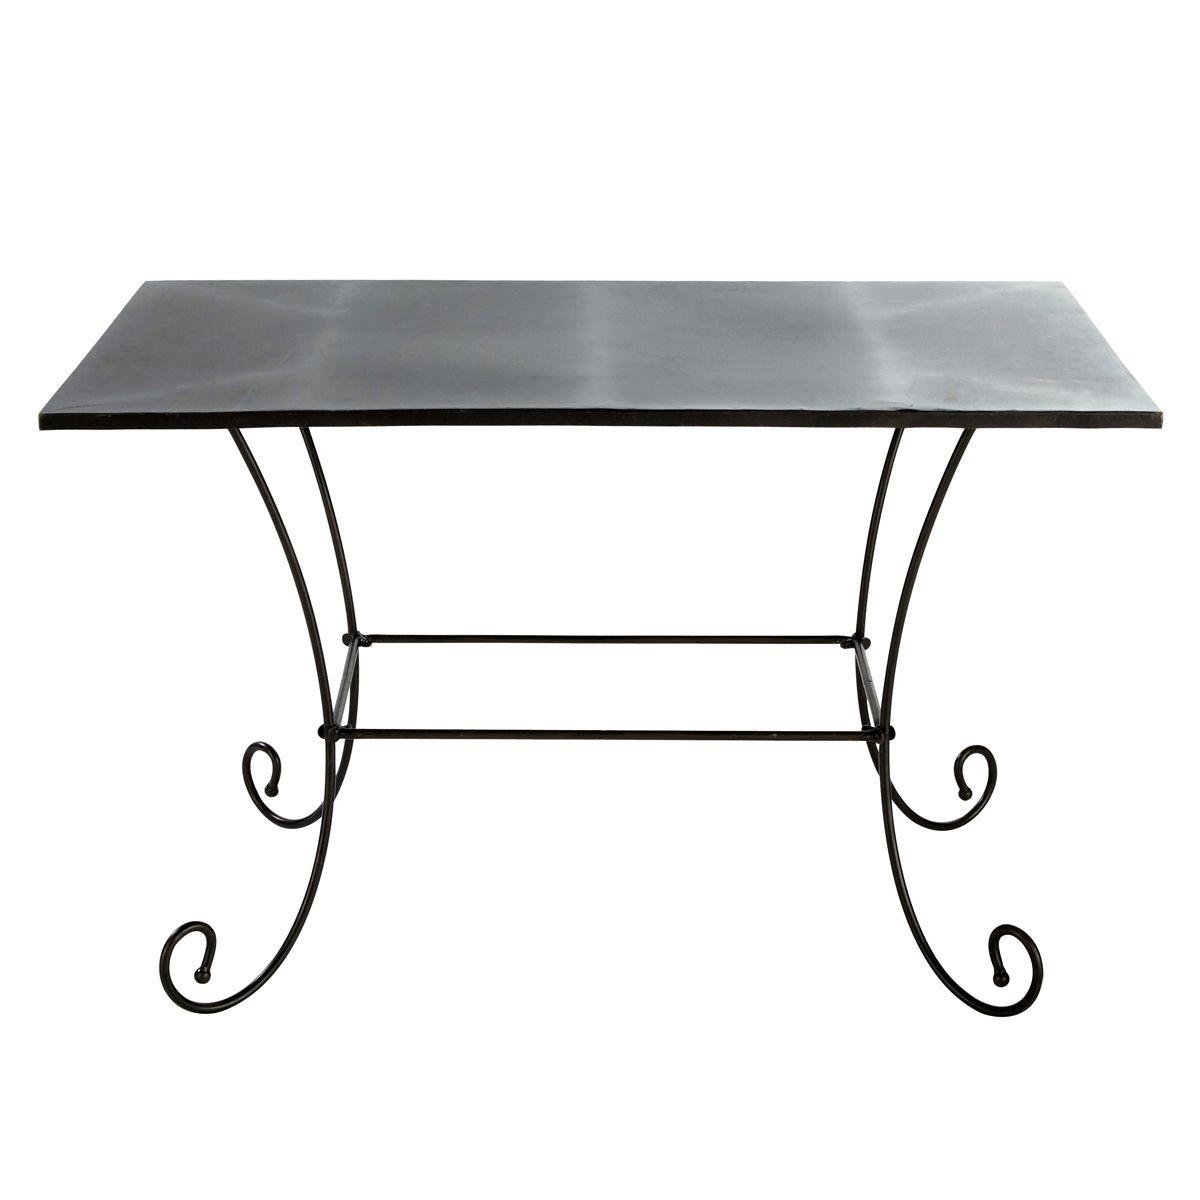 Mesa de jard n de hierro forjado negra l 125 cm hierro for Faroles en hierro forjado para jardin